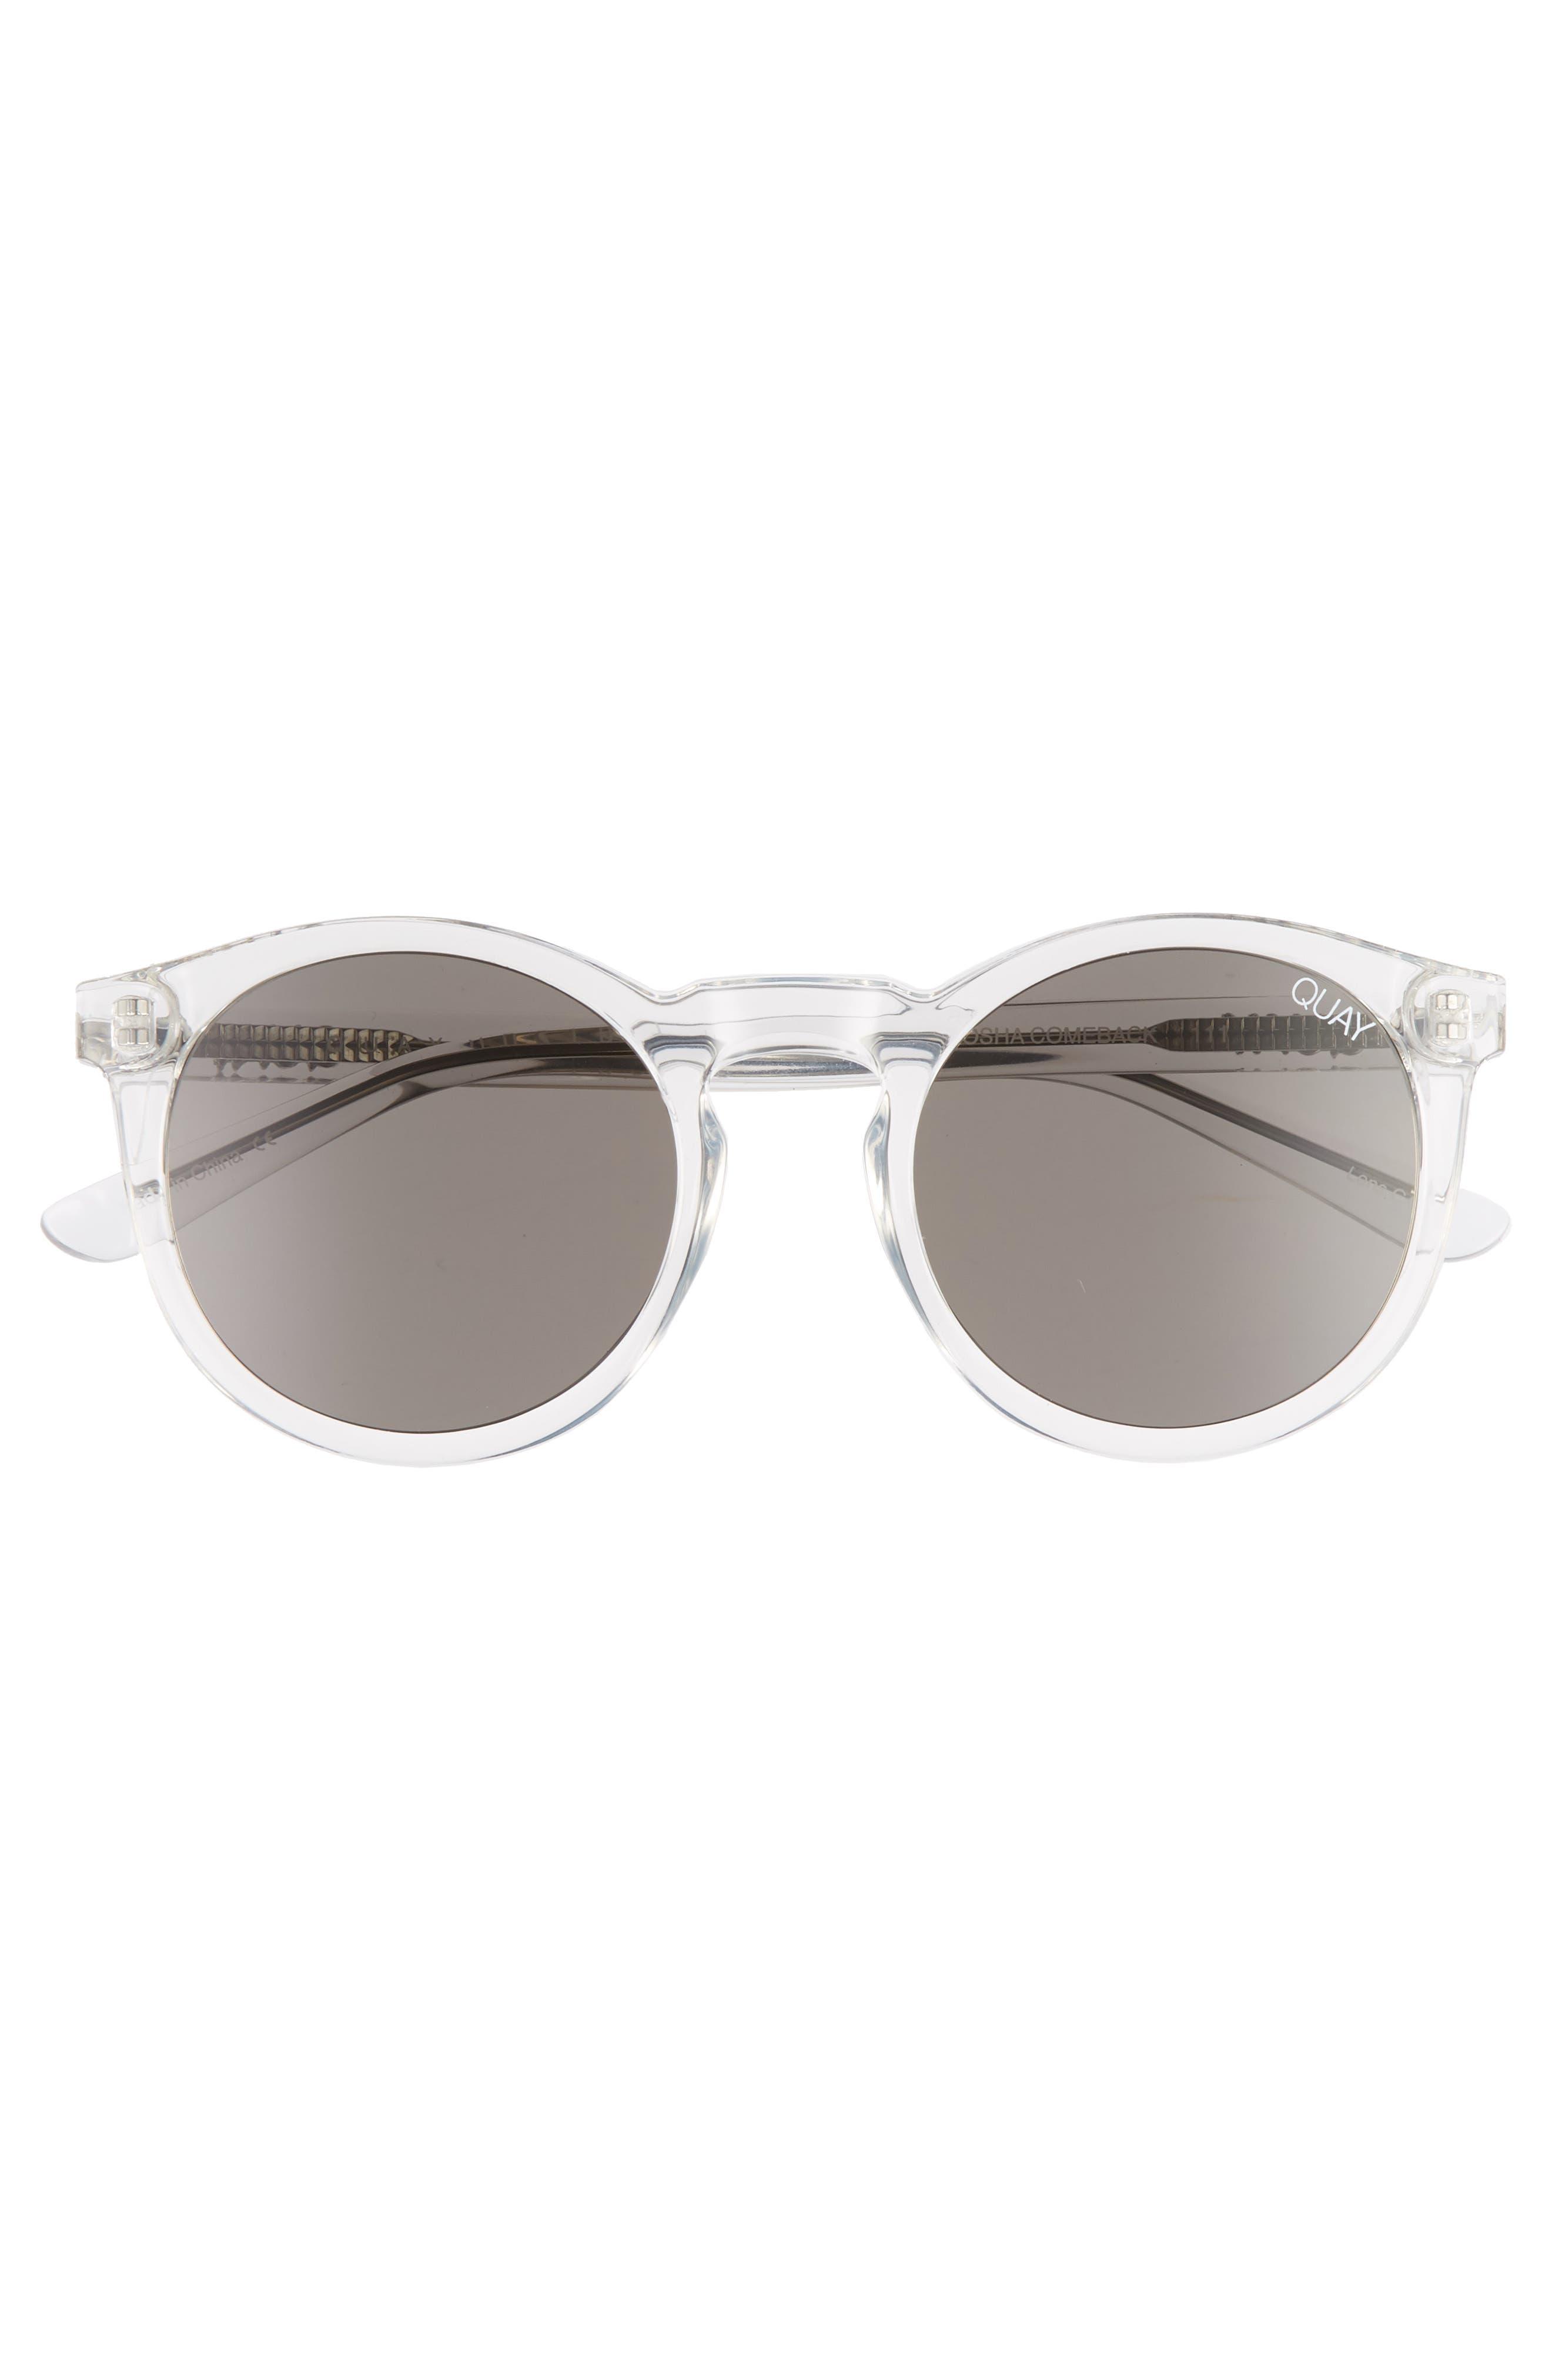 Kosha 49mm Round Sunglasses,                             Alternate thumbnail 5, color,